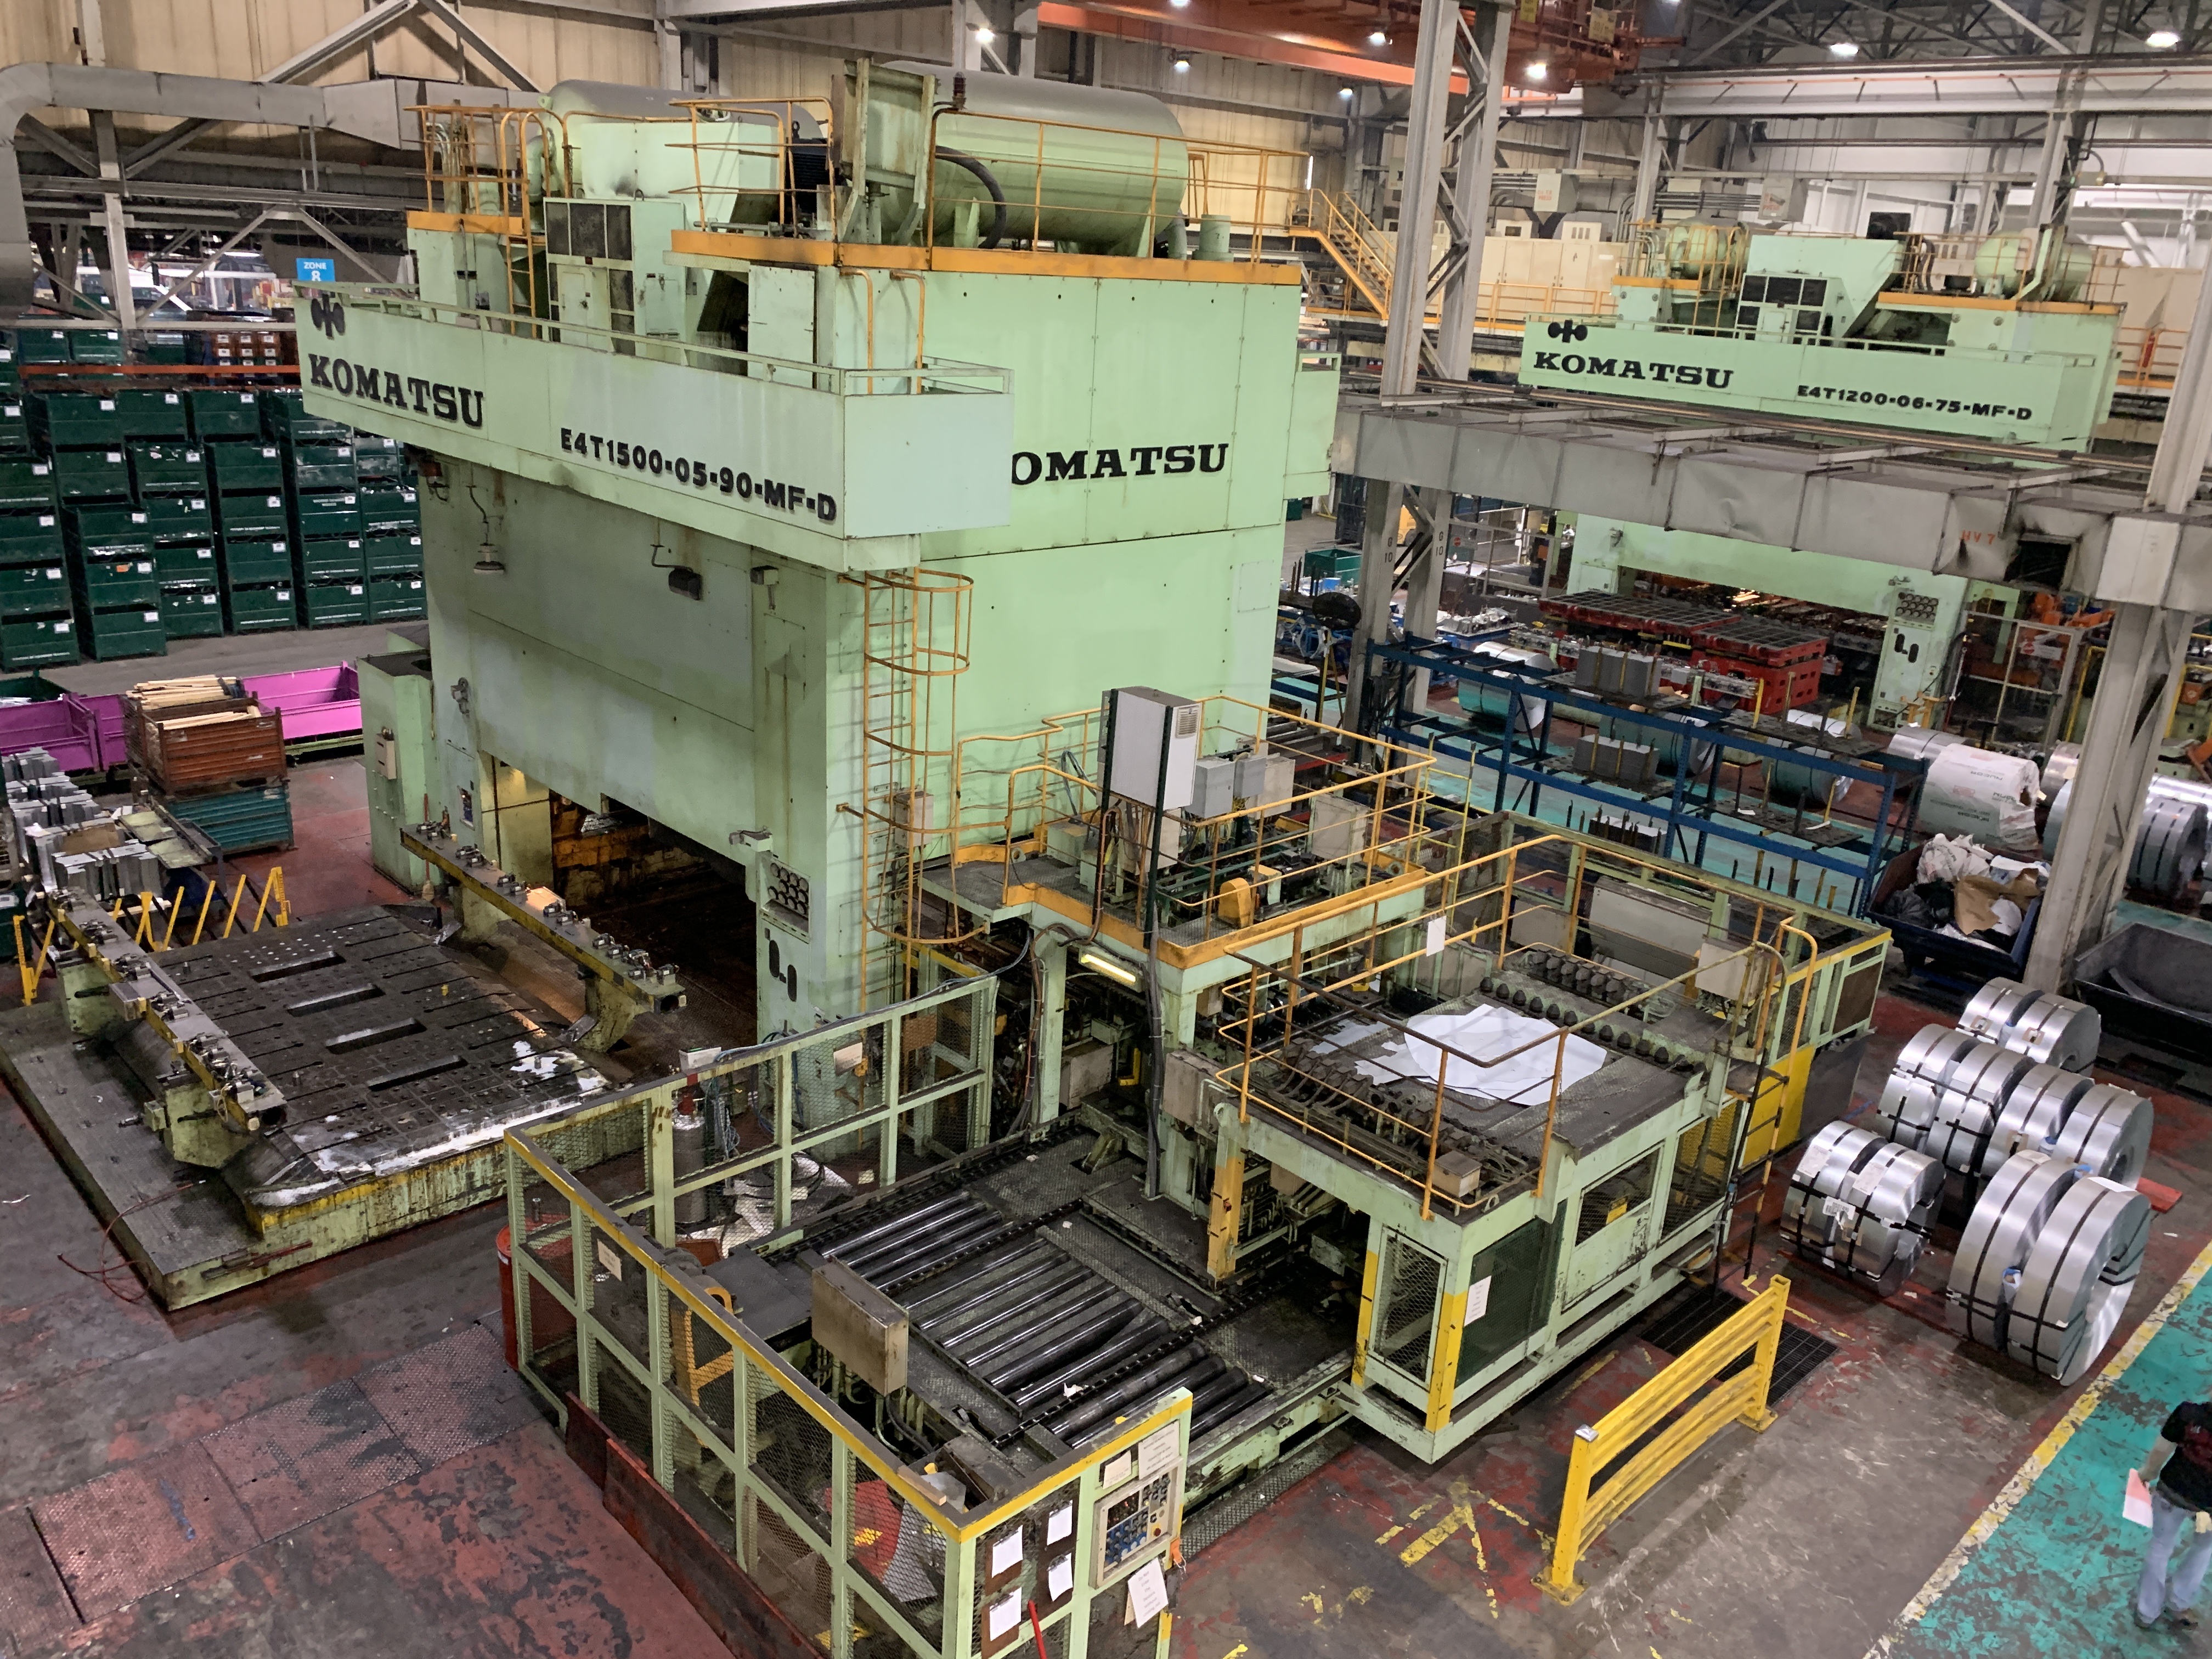 1500 Ton Komatsu Stamping Press For Sale At Master Machinery